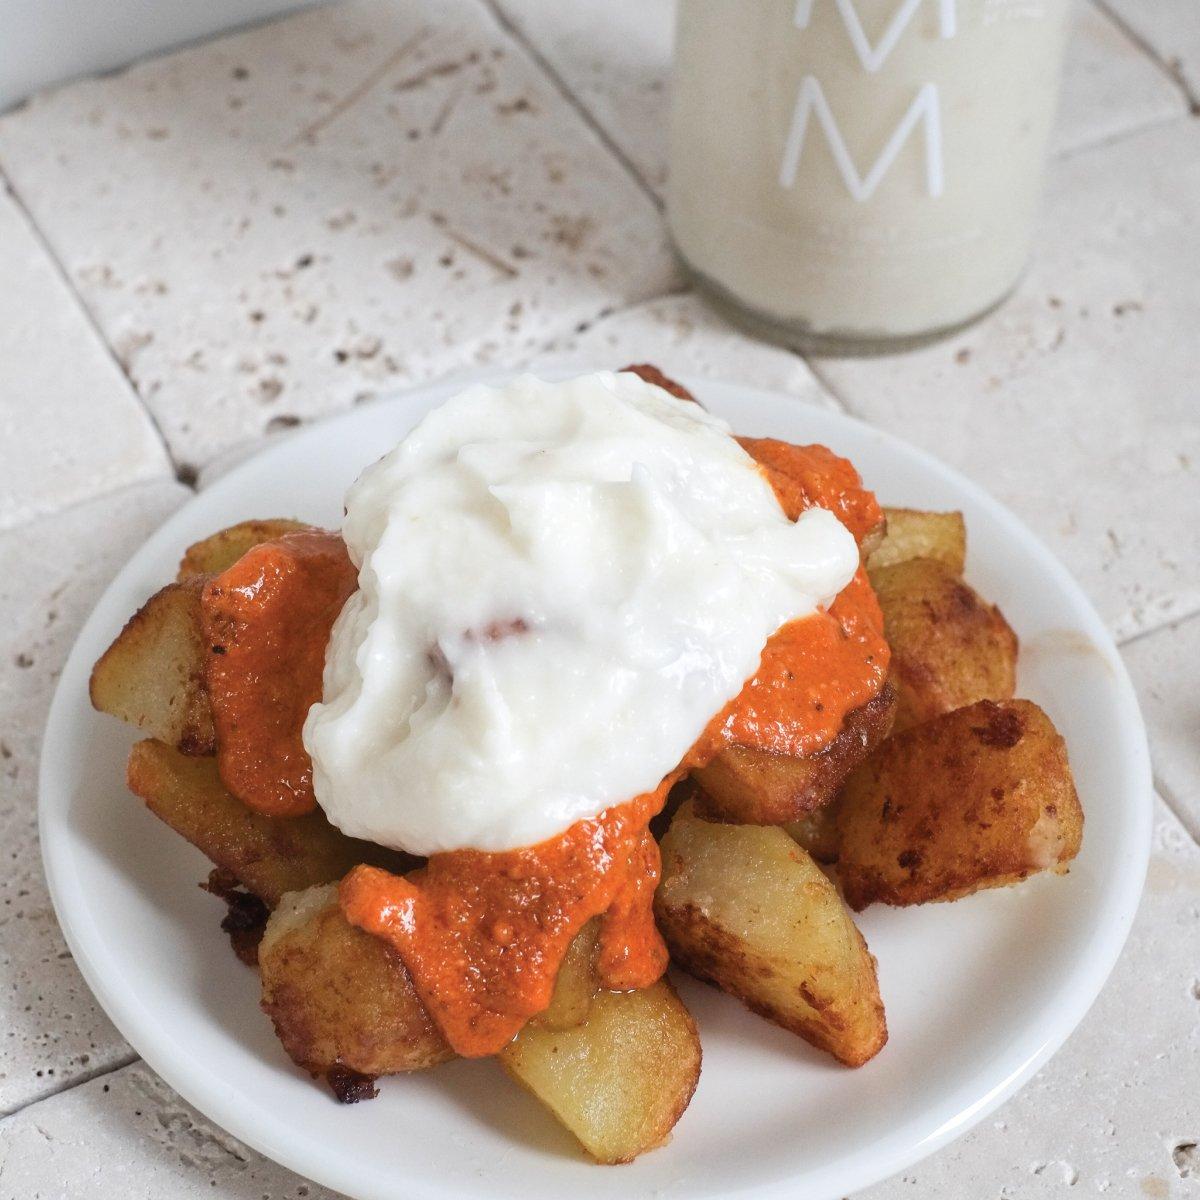 M M Alioli - Spanish Garlic Mayonnaise